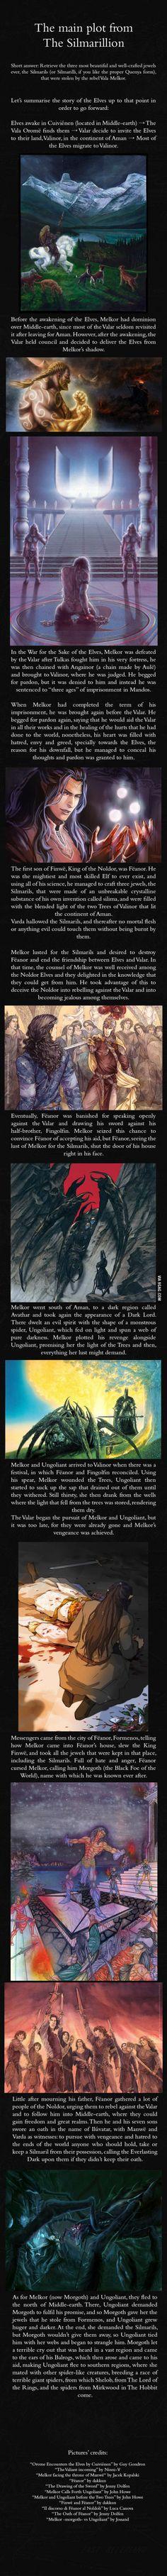 The Silmarillion's main plot - J.R.R. Tolkien's Mythology